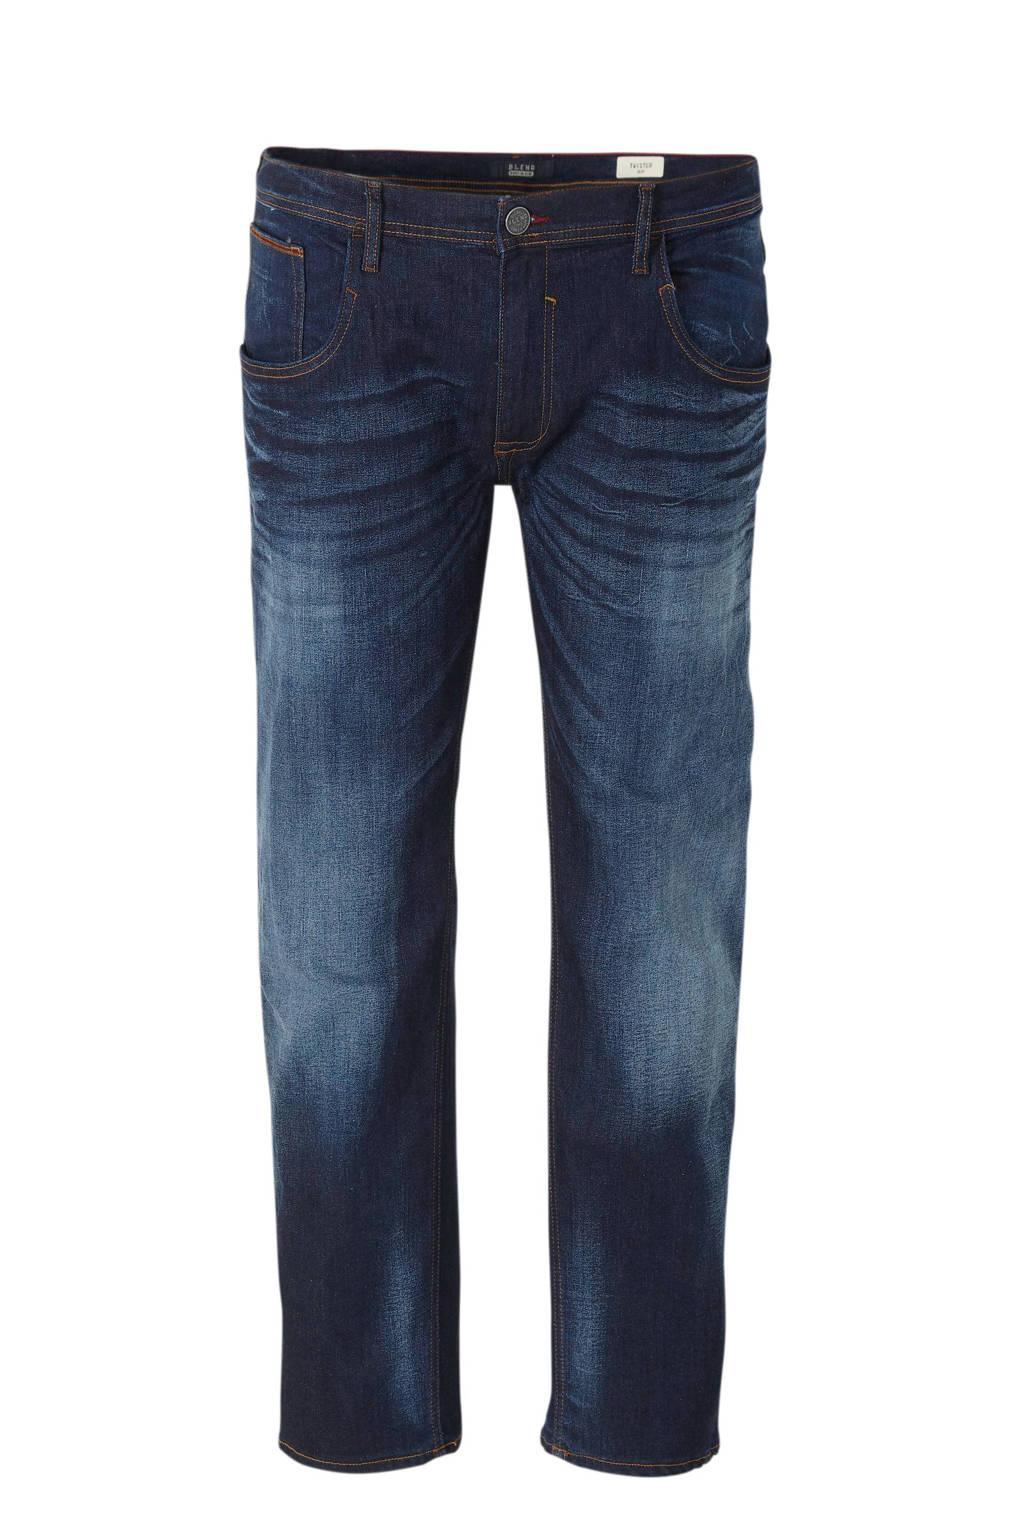 Blend Big slim fit jeans Twister 76207 denim dark blue, 76207 Denim Dark Blue